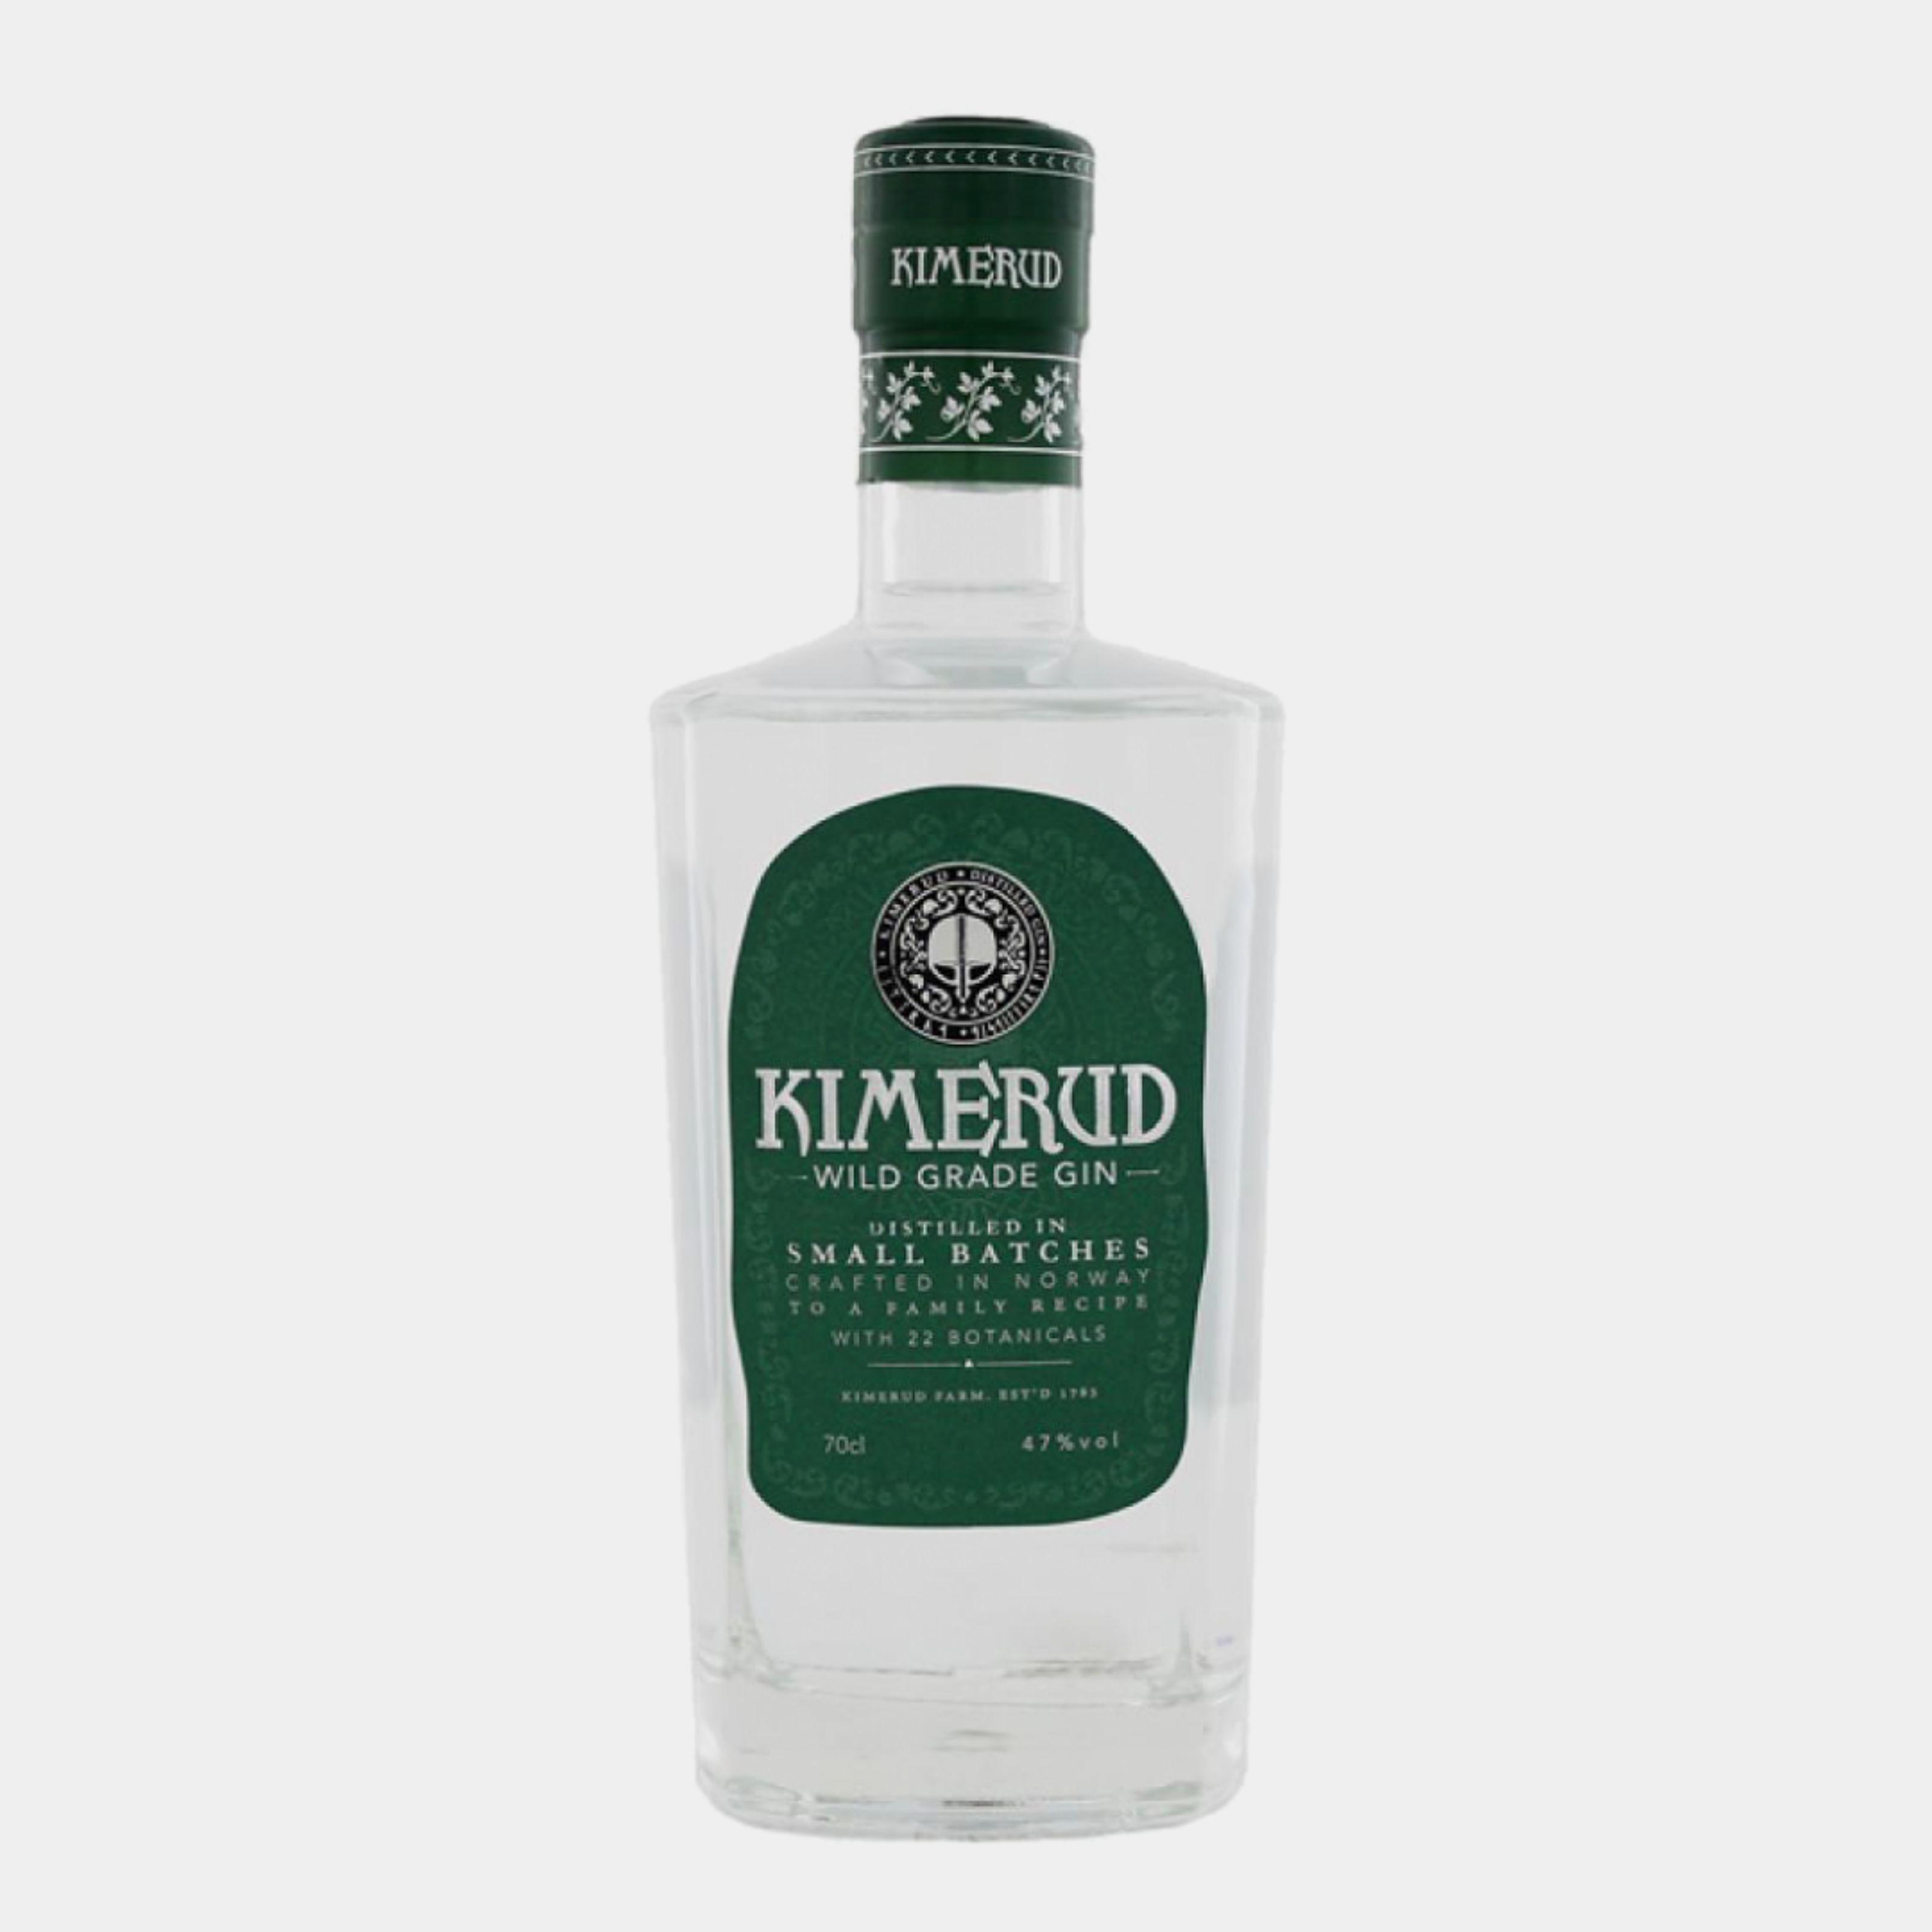 Kimerud Wild Grade Gin 0.7l 47% Alk.